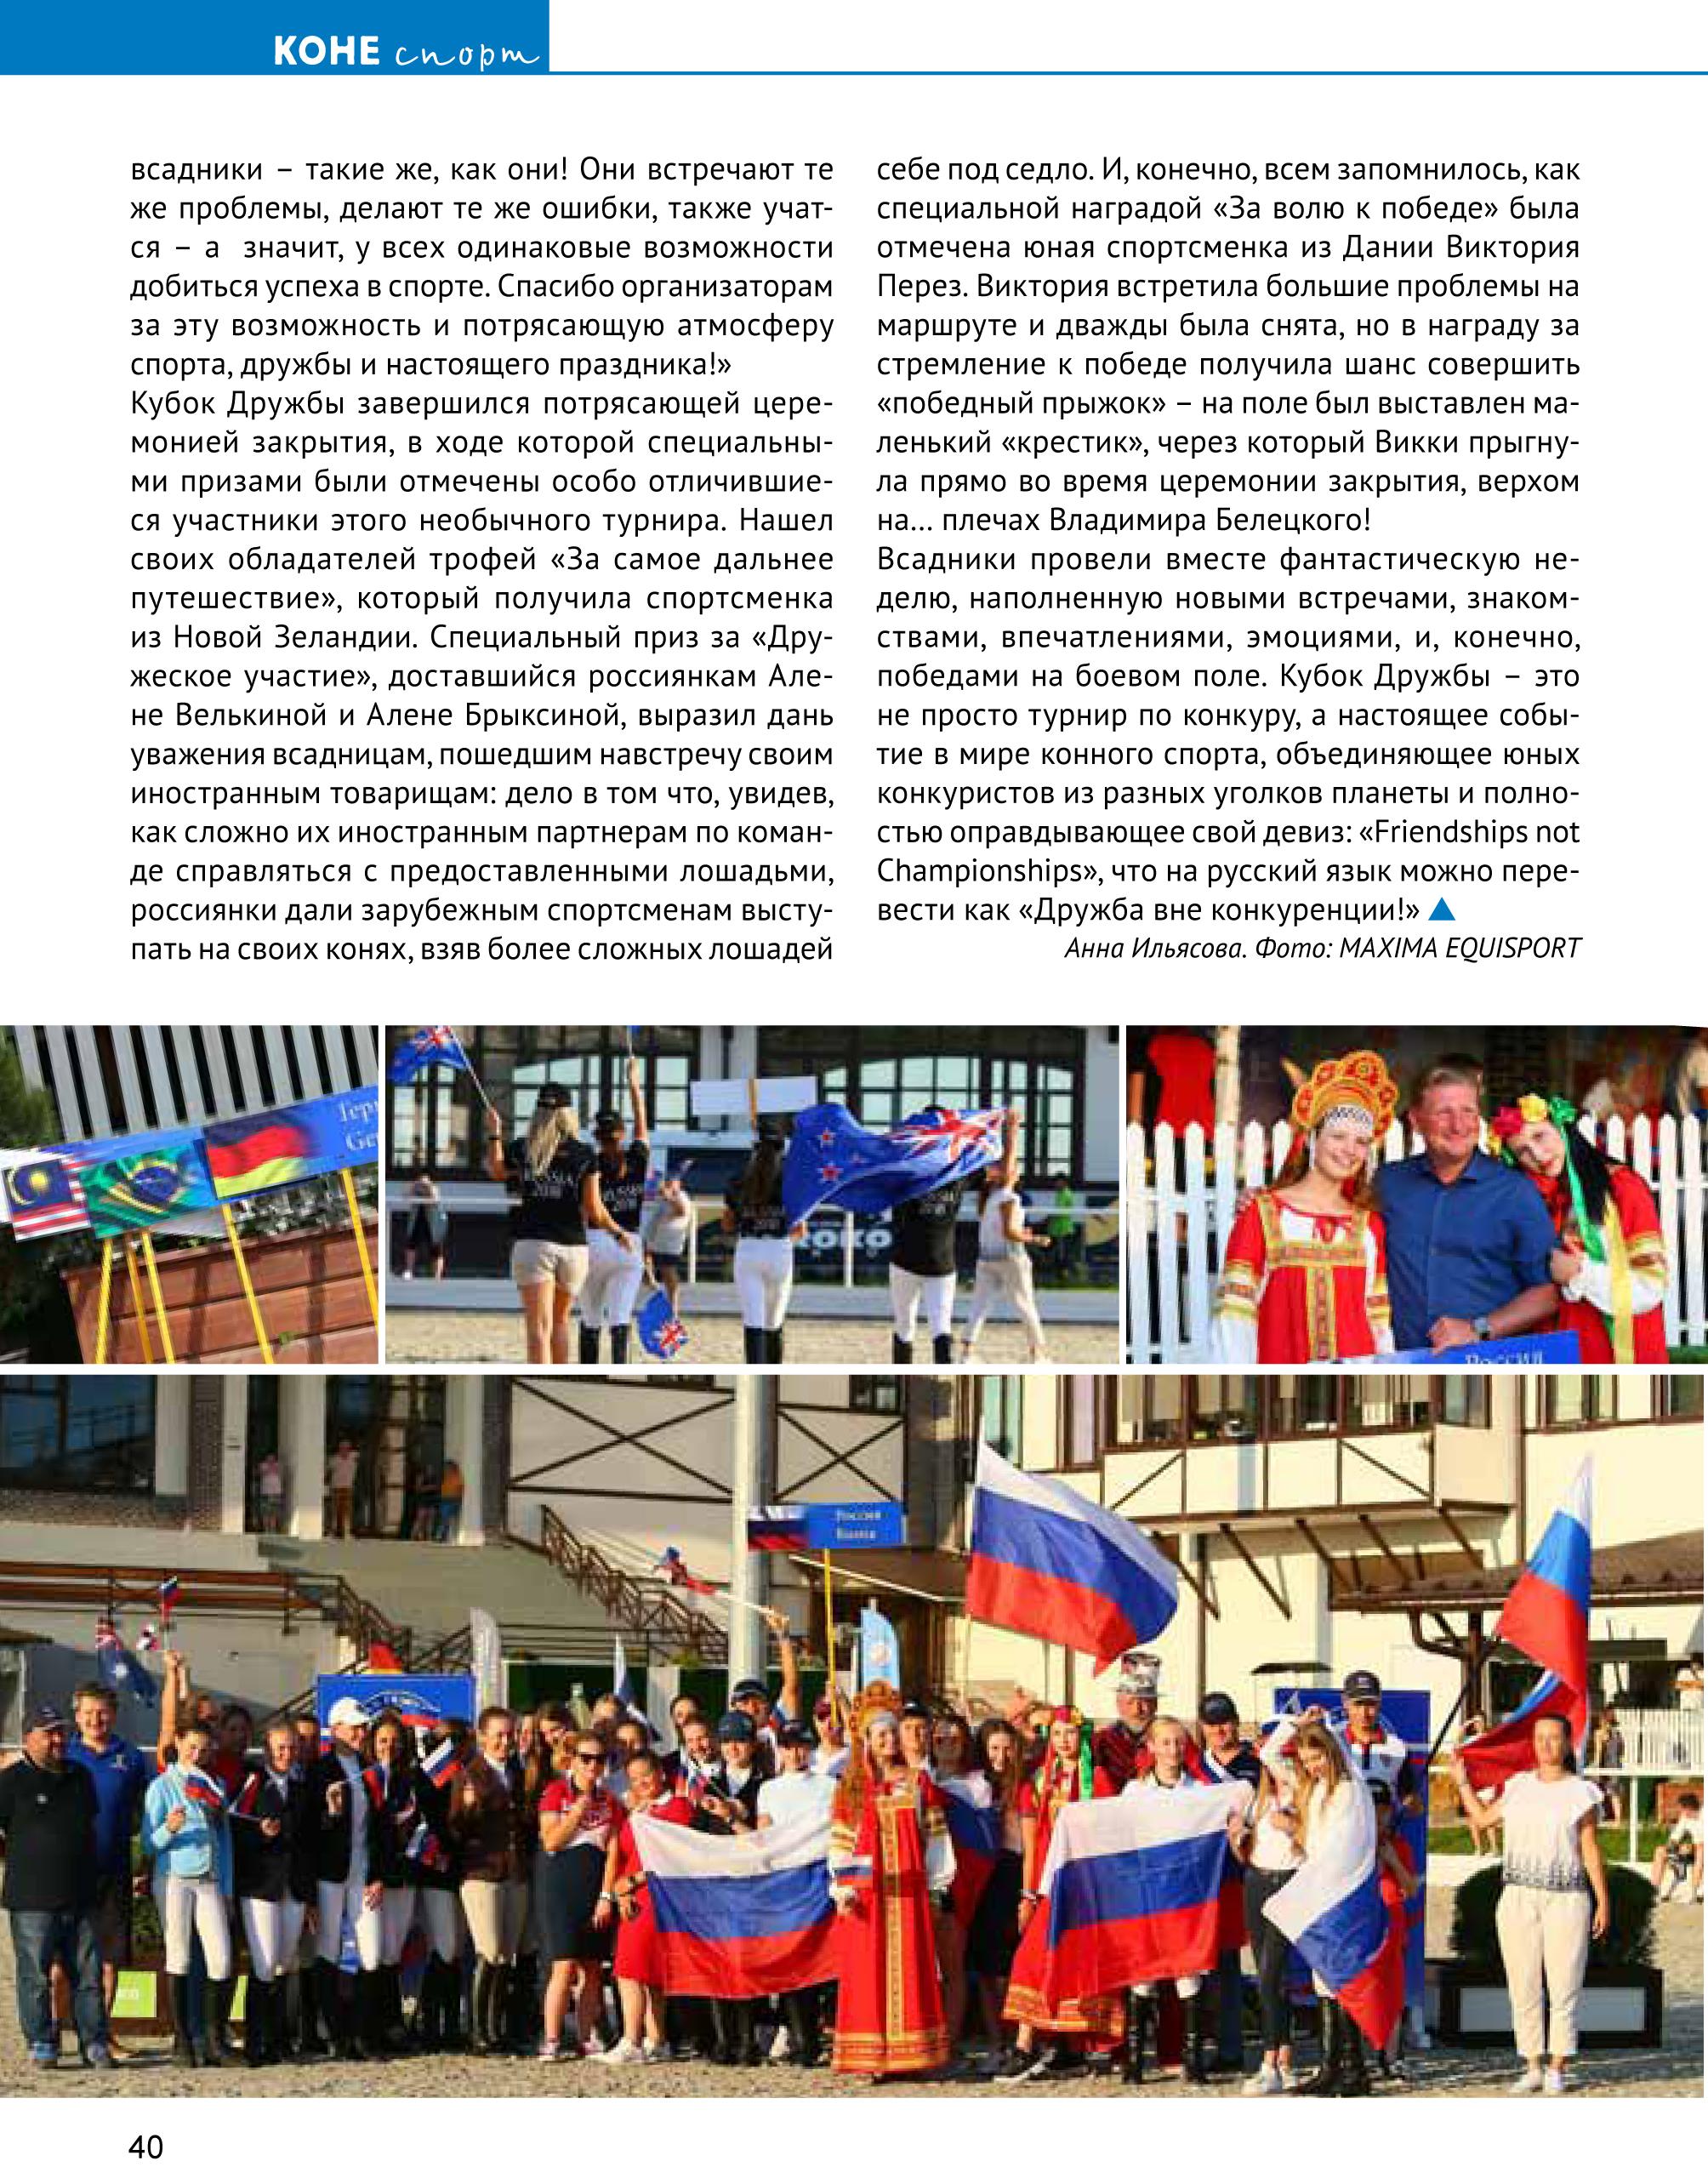 Book 5 2018 ДЛЯ САЙТА-40